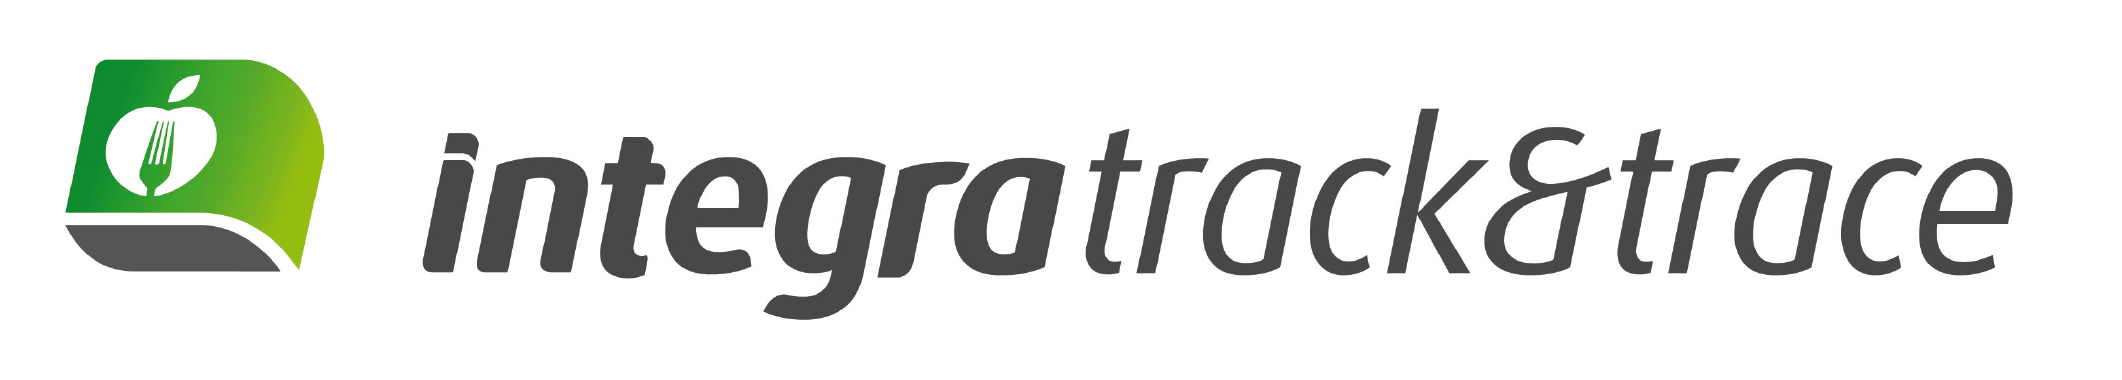 Integra Track & Trace